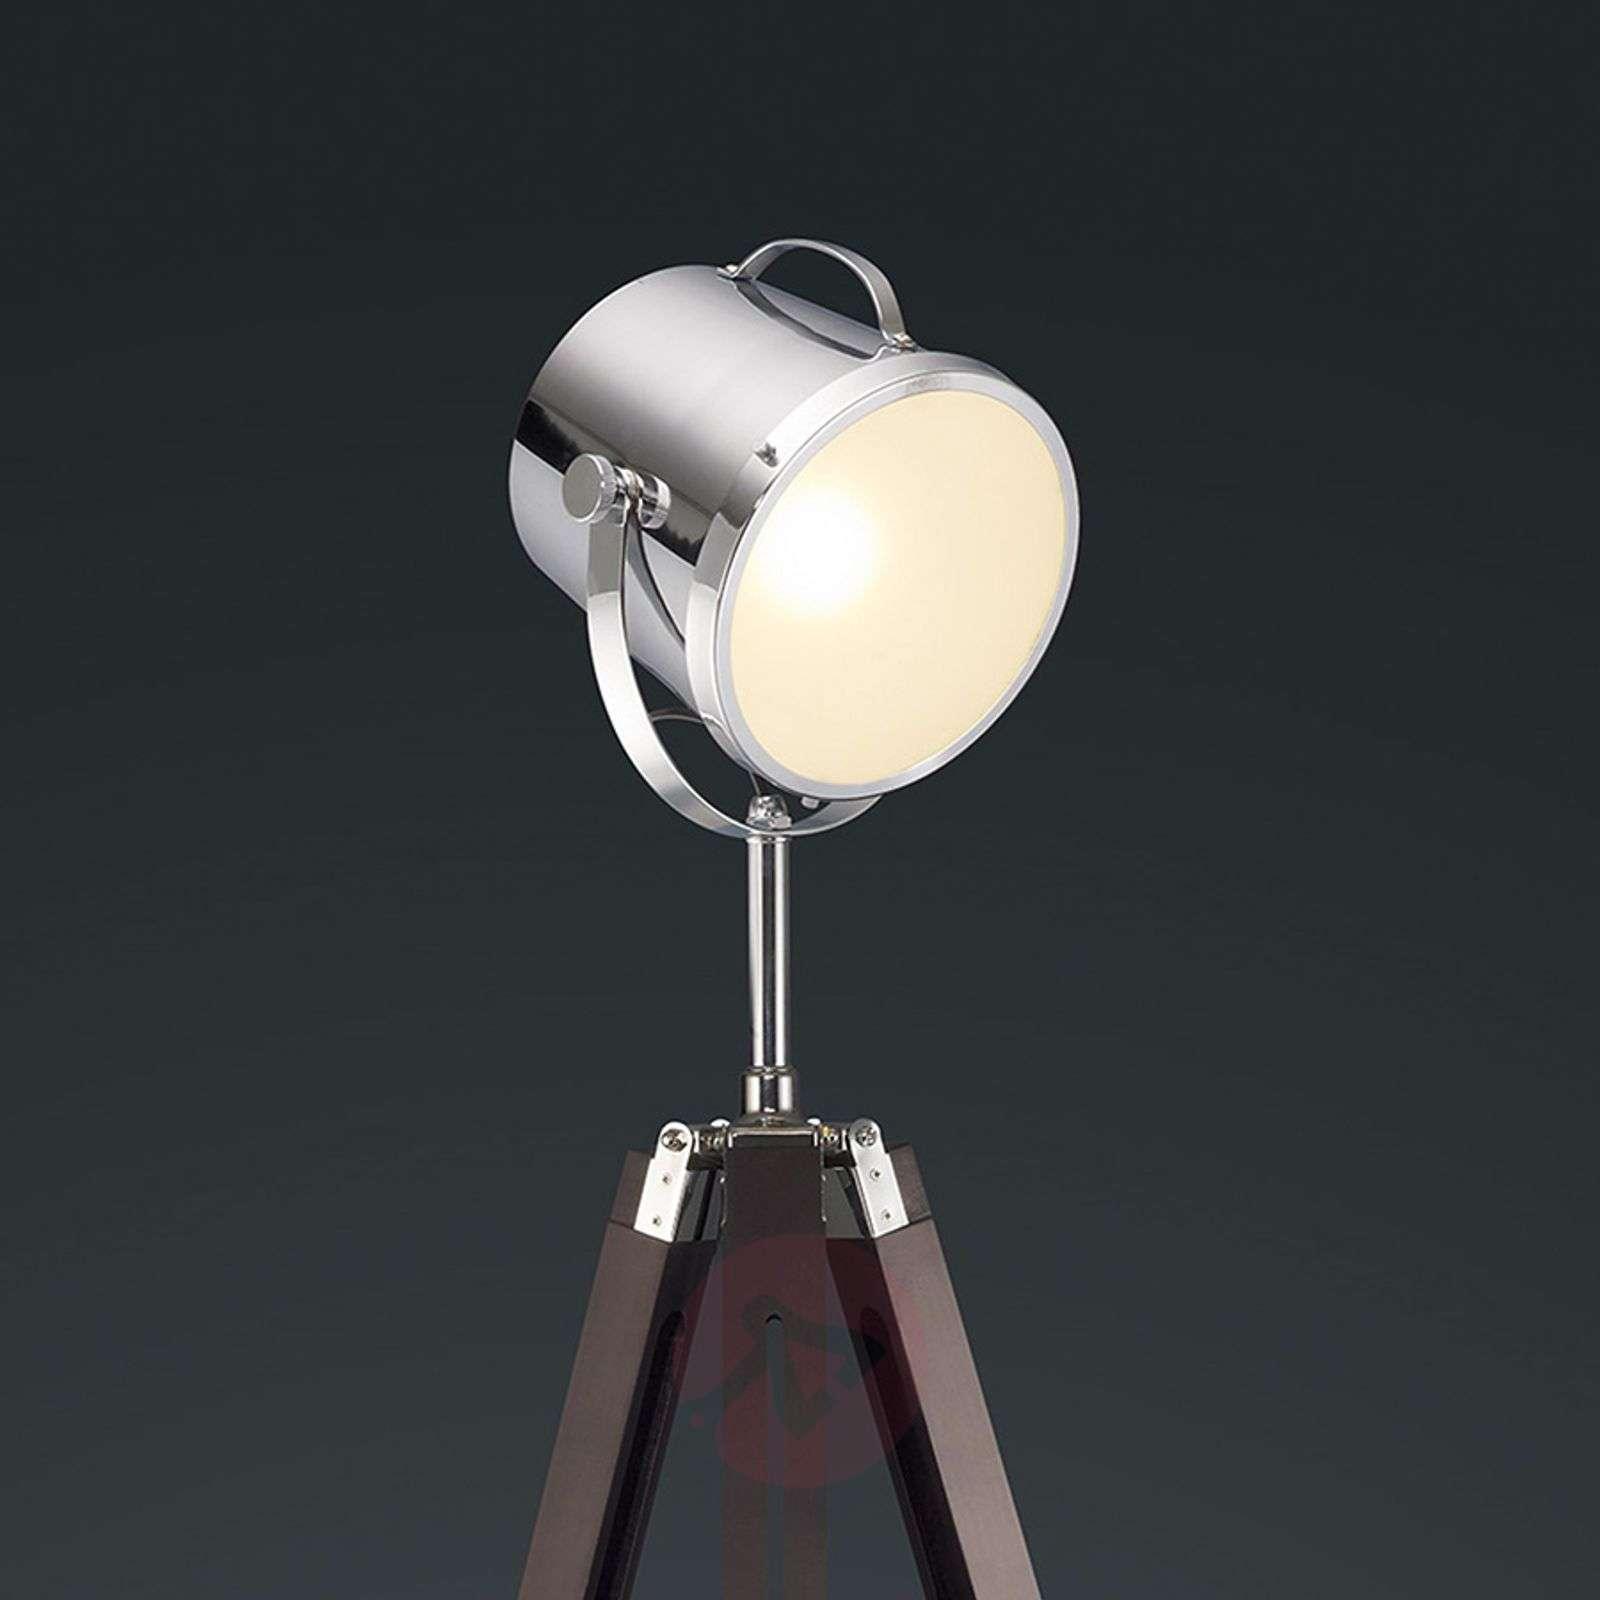 Floodlight-style Antwerp floor lamp-9005086-01